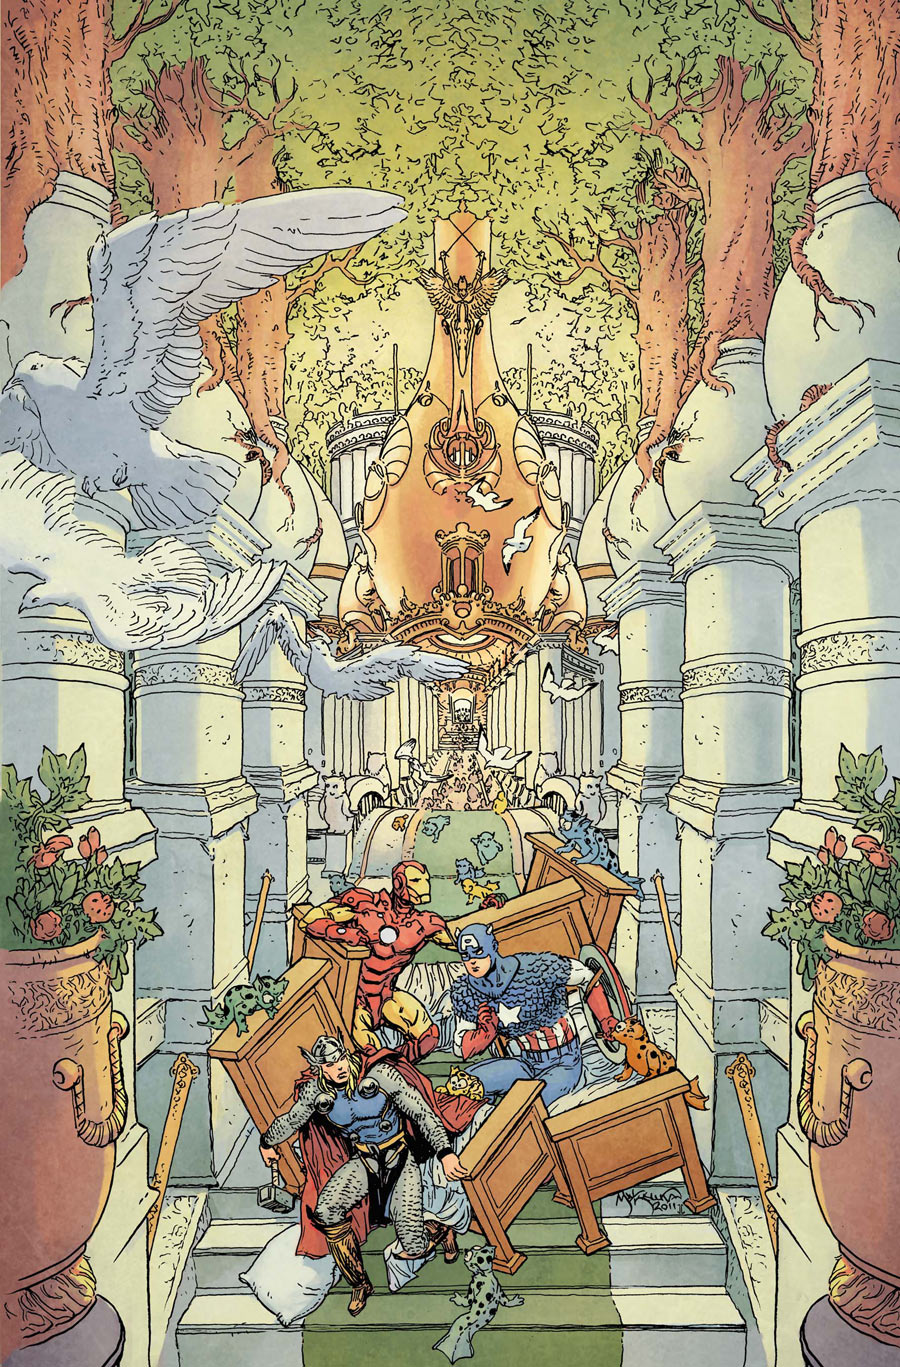 Fantastic Four #605 (2012) - Marvel. Avengers Art Appreciation Variant Cover By Michael Kaluta